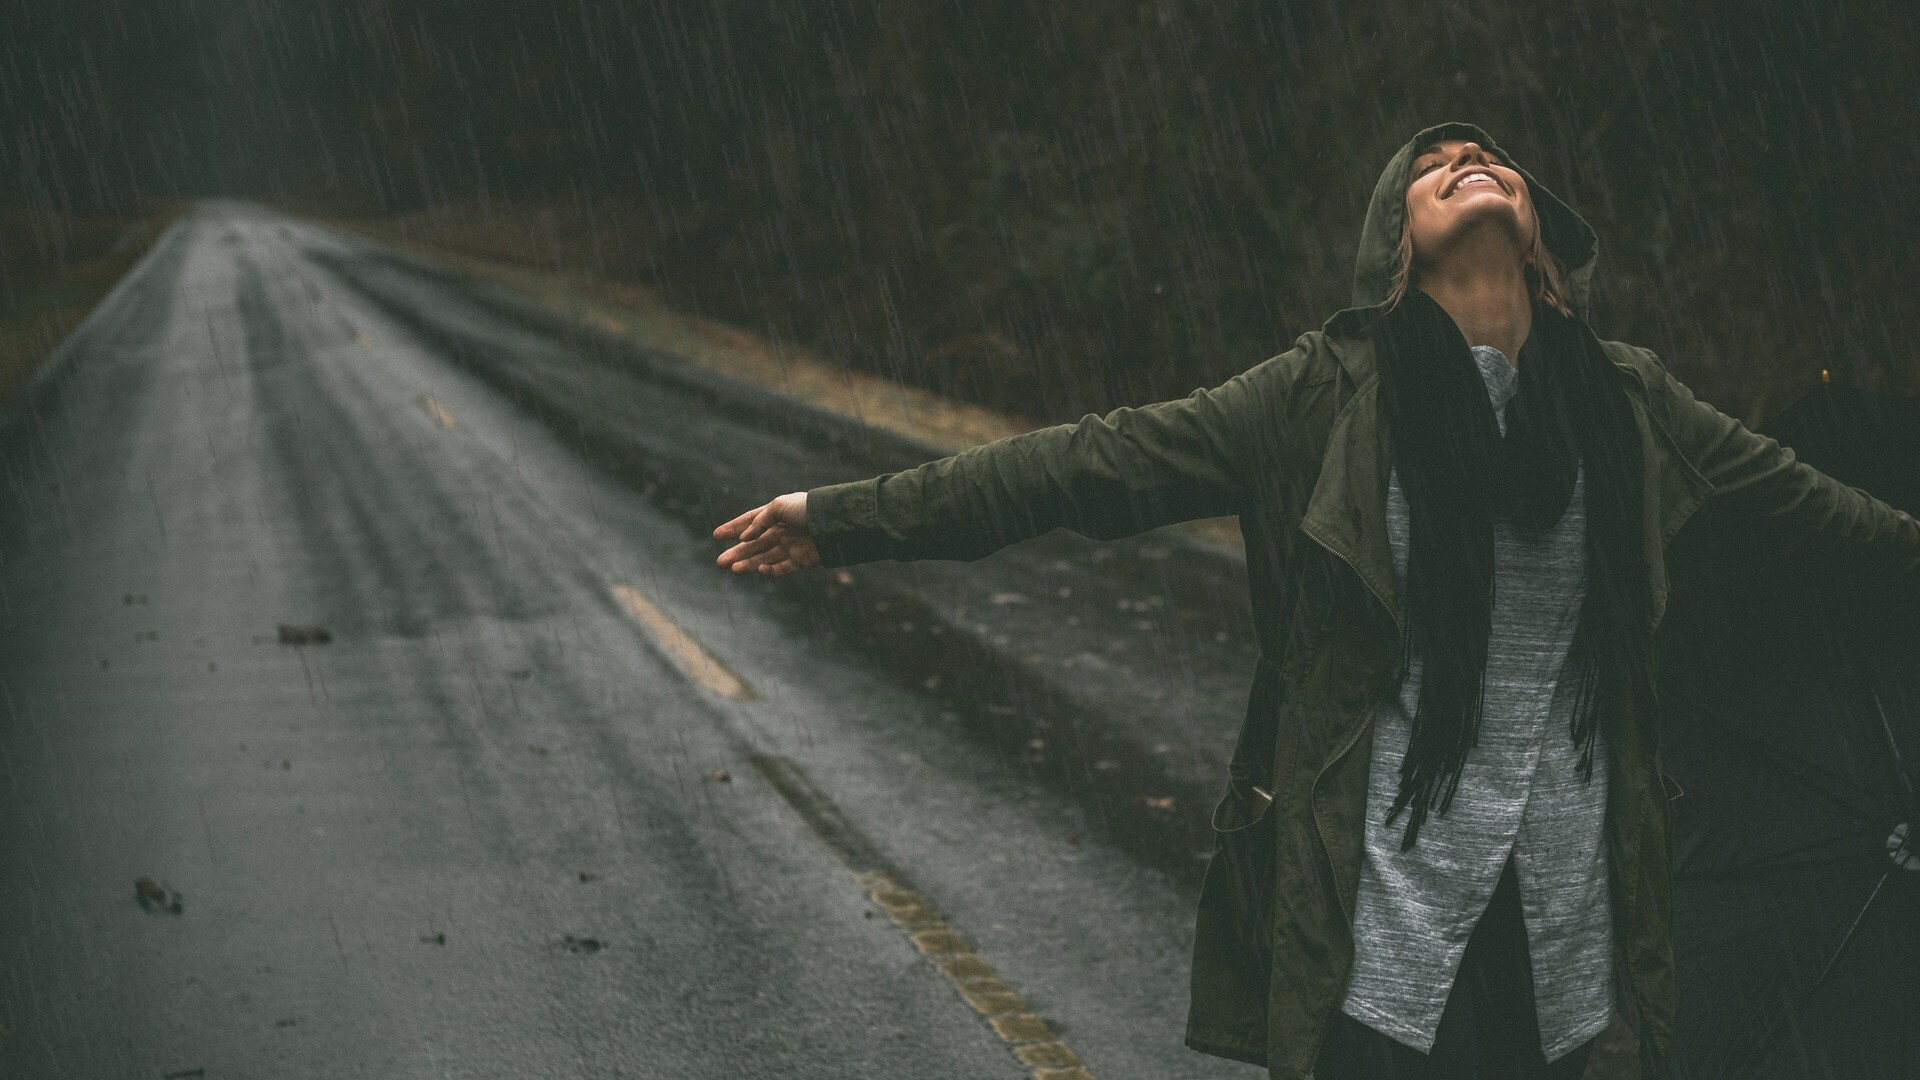 Girl Enjoying Rain On Street Hd Wallpaper Hd Wallpapers